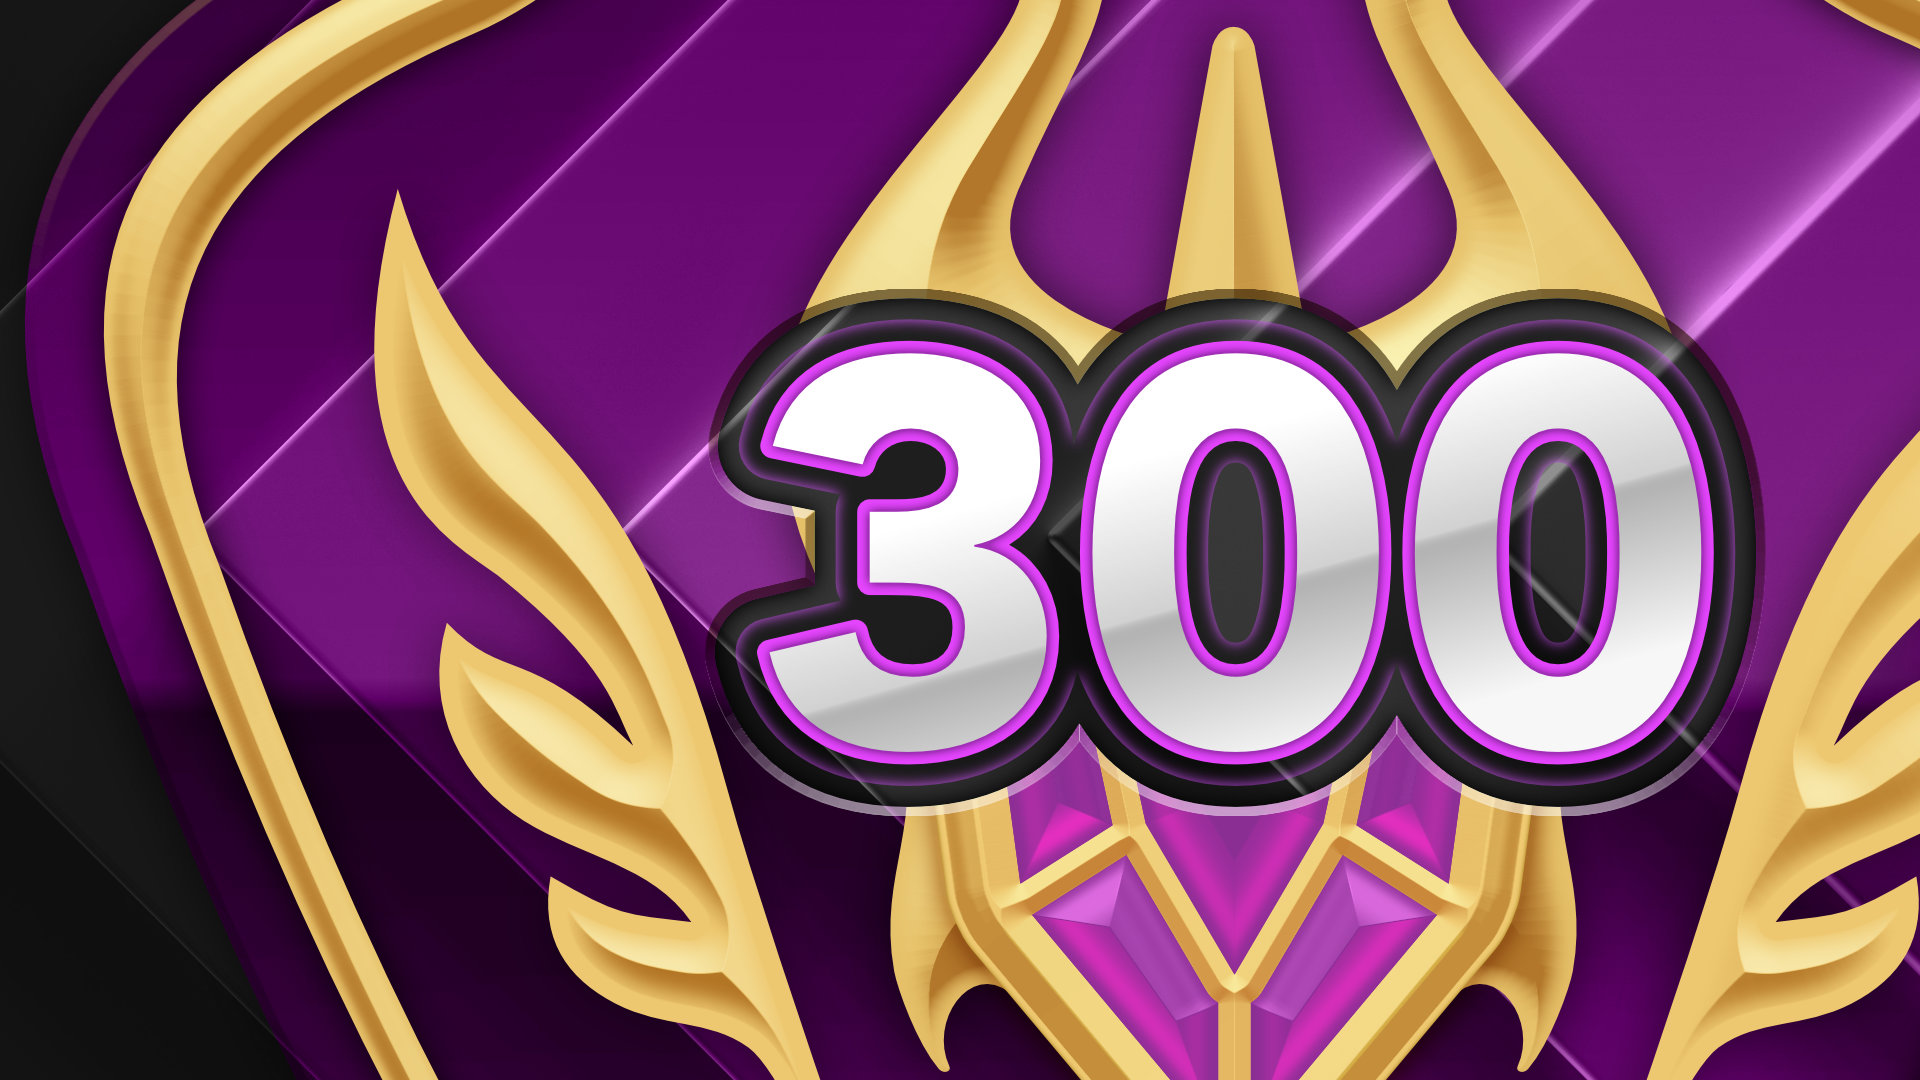 Retro Encounter 300